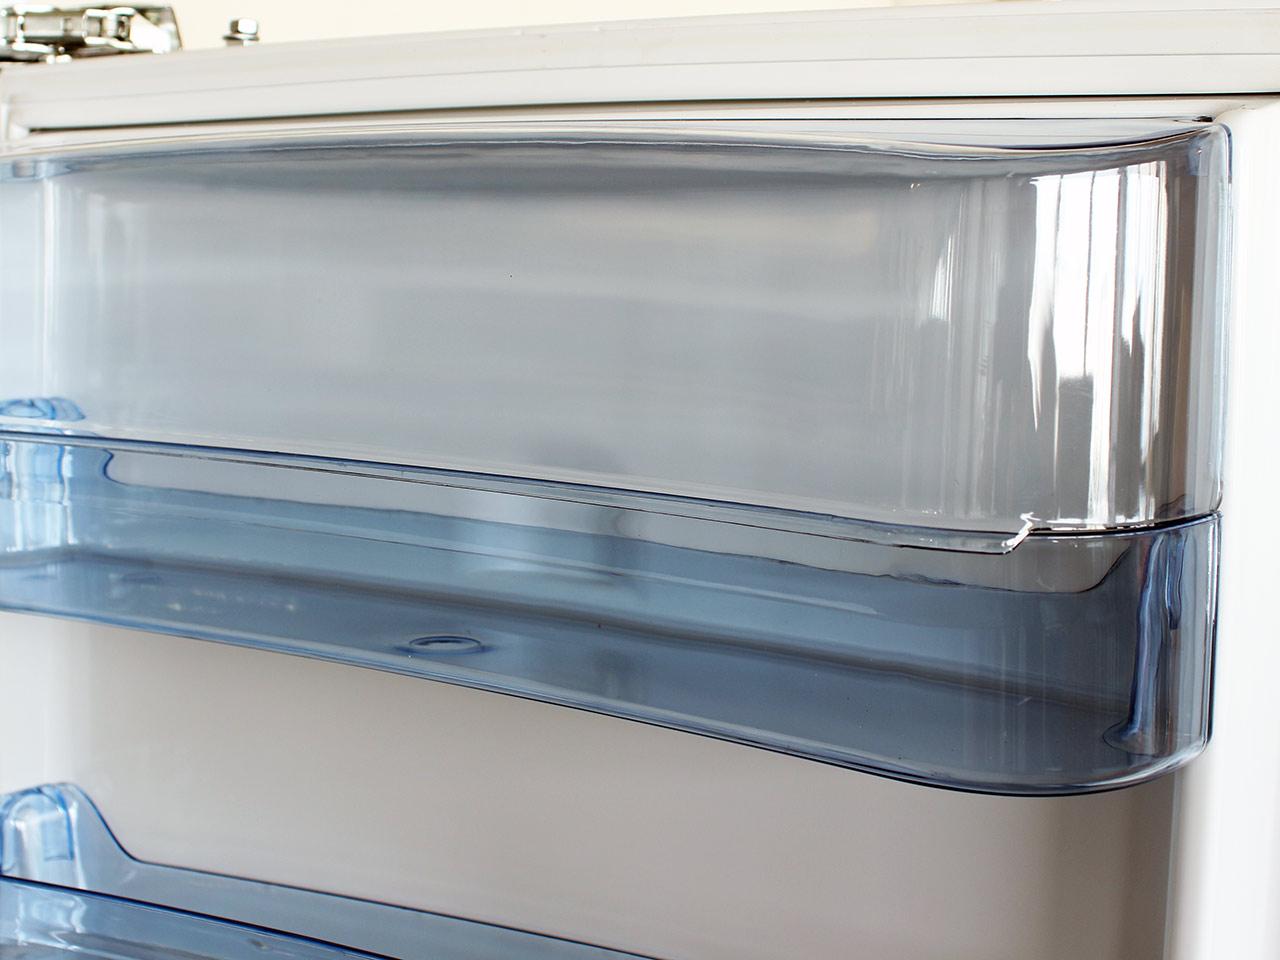 amica einbau k hl gefrier kombination festt rtechnik 177cm hoch ebay. Black Bedroom Furniture Sets. Home Design Ideas